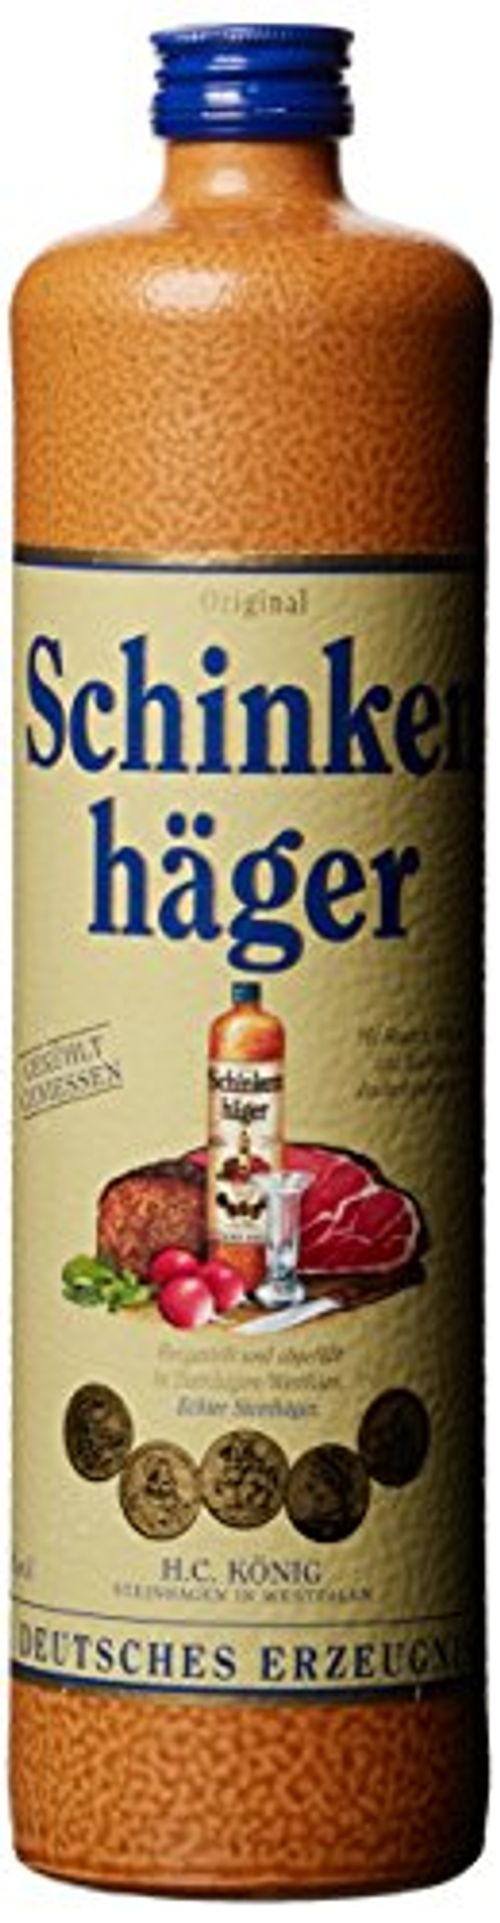 photo Wallpaper of Schinkenhäger-Schinkenhäger Spirituosen (1 X 0.7 L)-